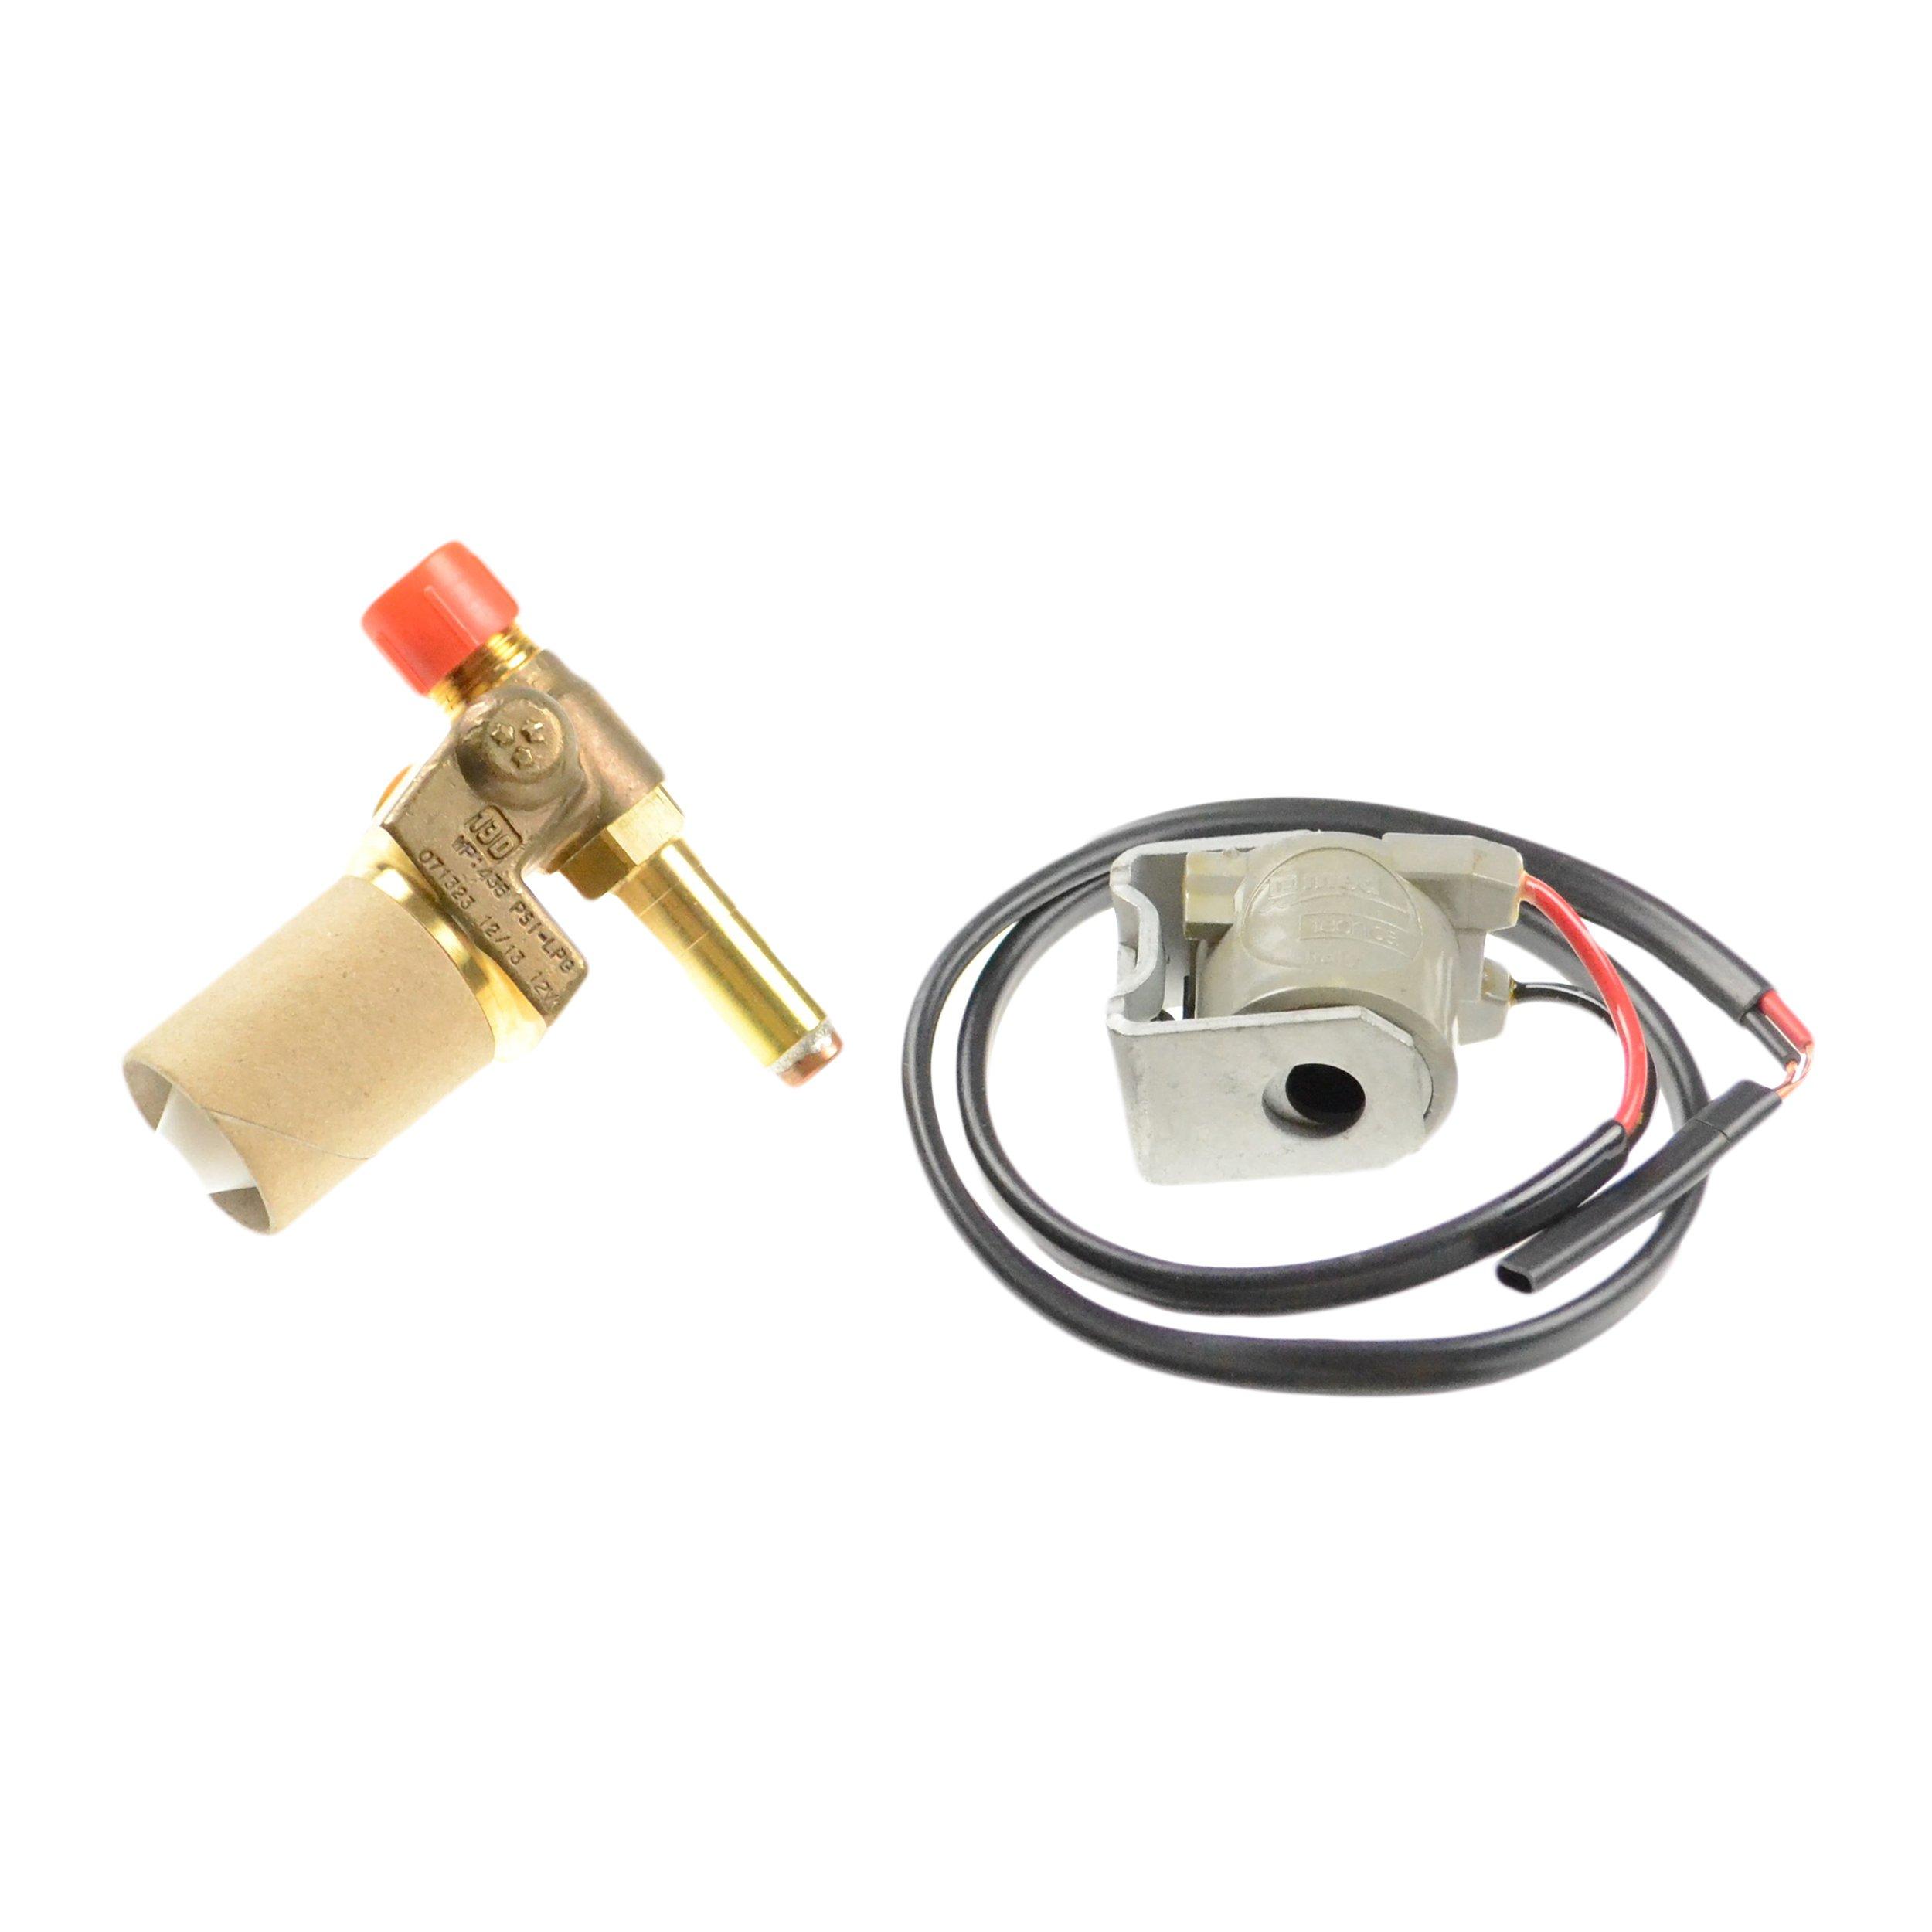 Fuel Pump Module Herko 001GE for Ford Bronco Explorer F150 F250 89-97